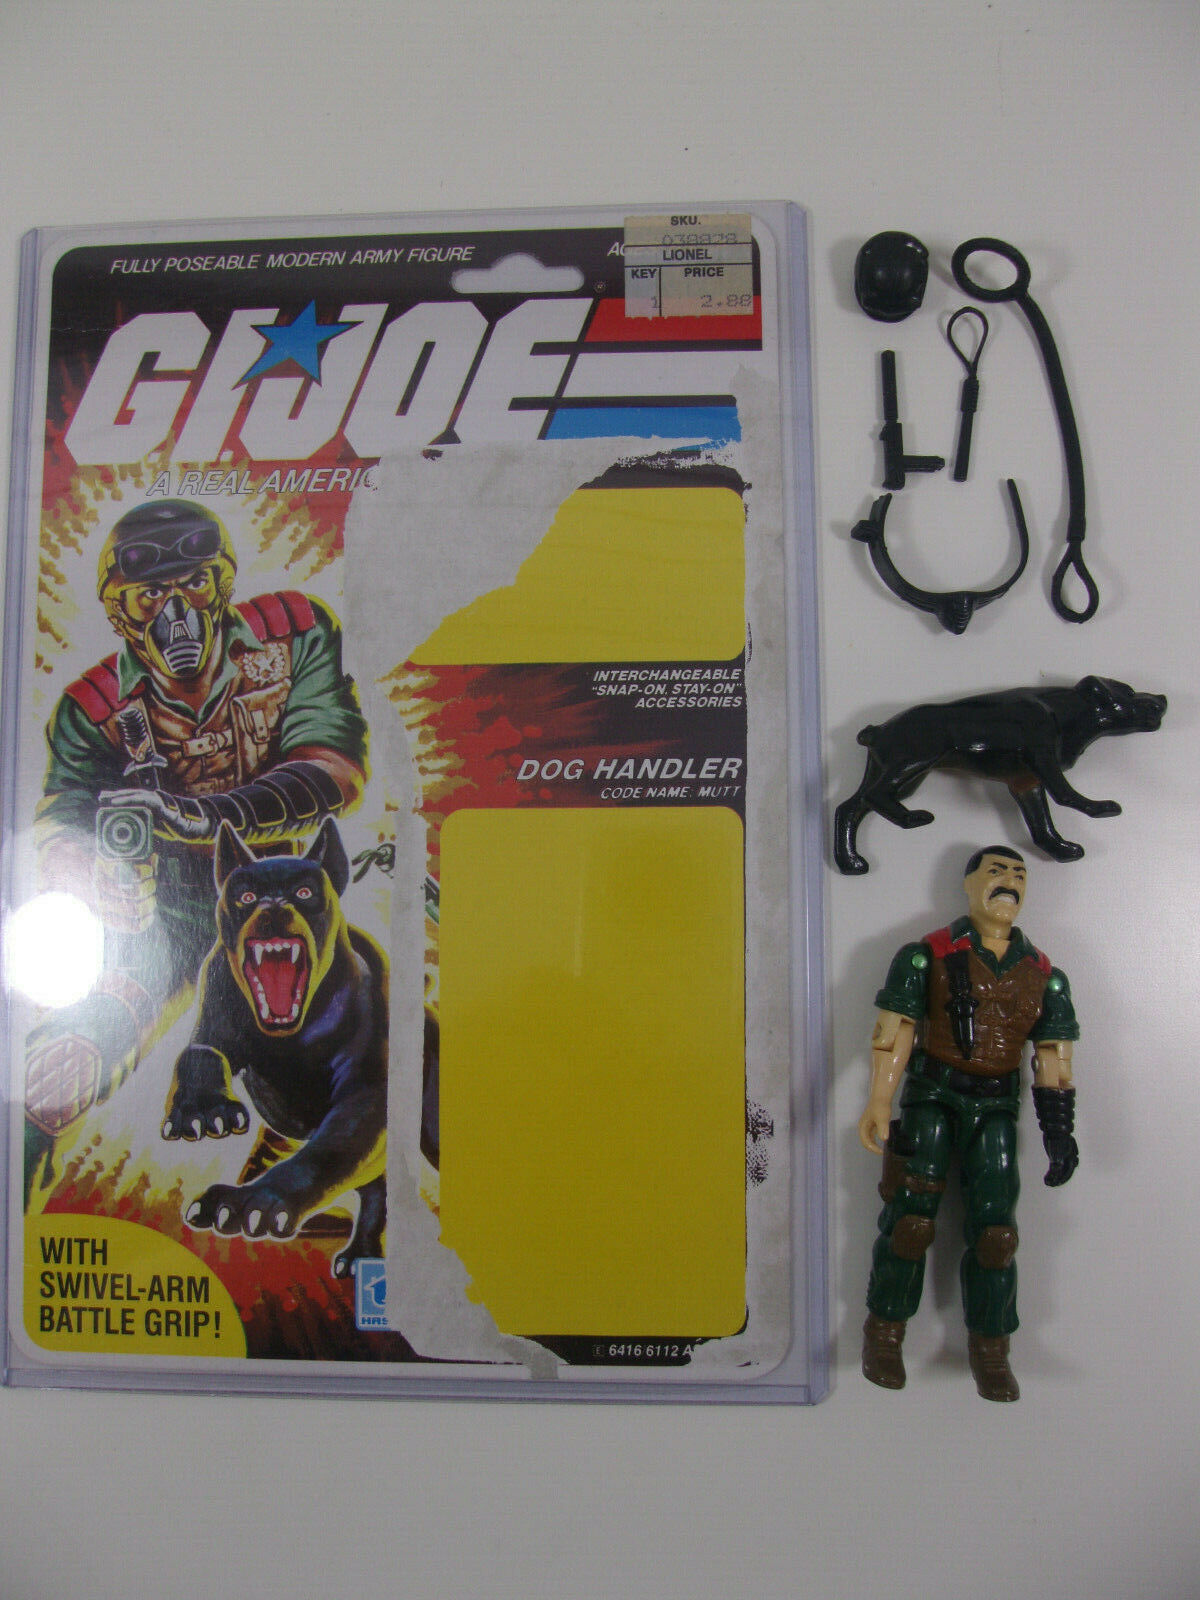 1984 GI JOE un vero eroe americano Heler Mutt & JUNKYARD COMPLETO COMPLETO UNCUT fileautod Retro